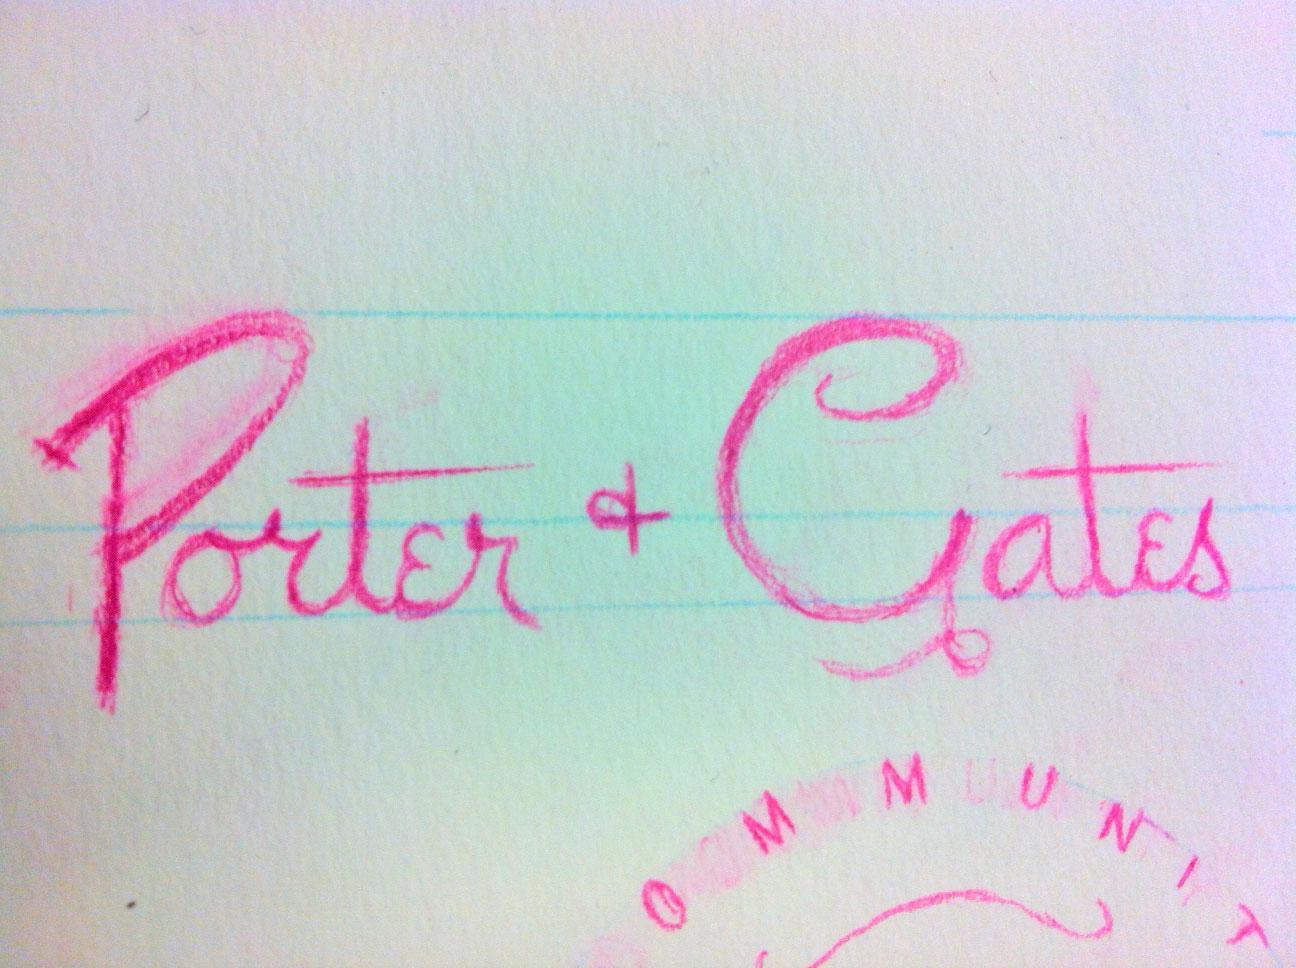 Porter+Gates Logo Sketches - image 4 - student project